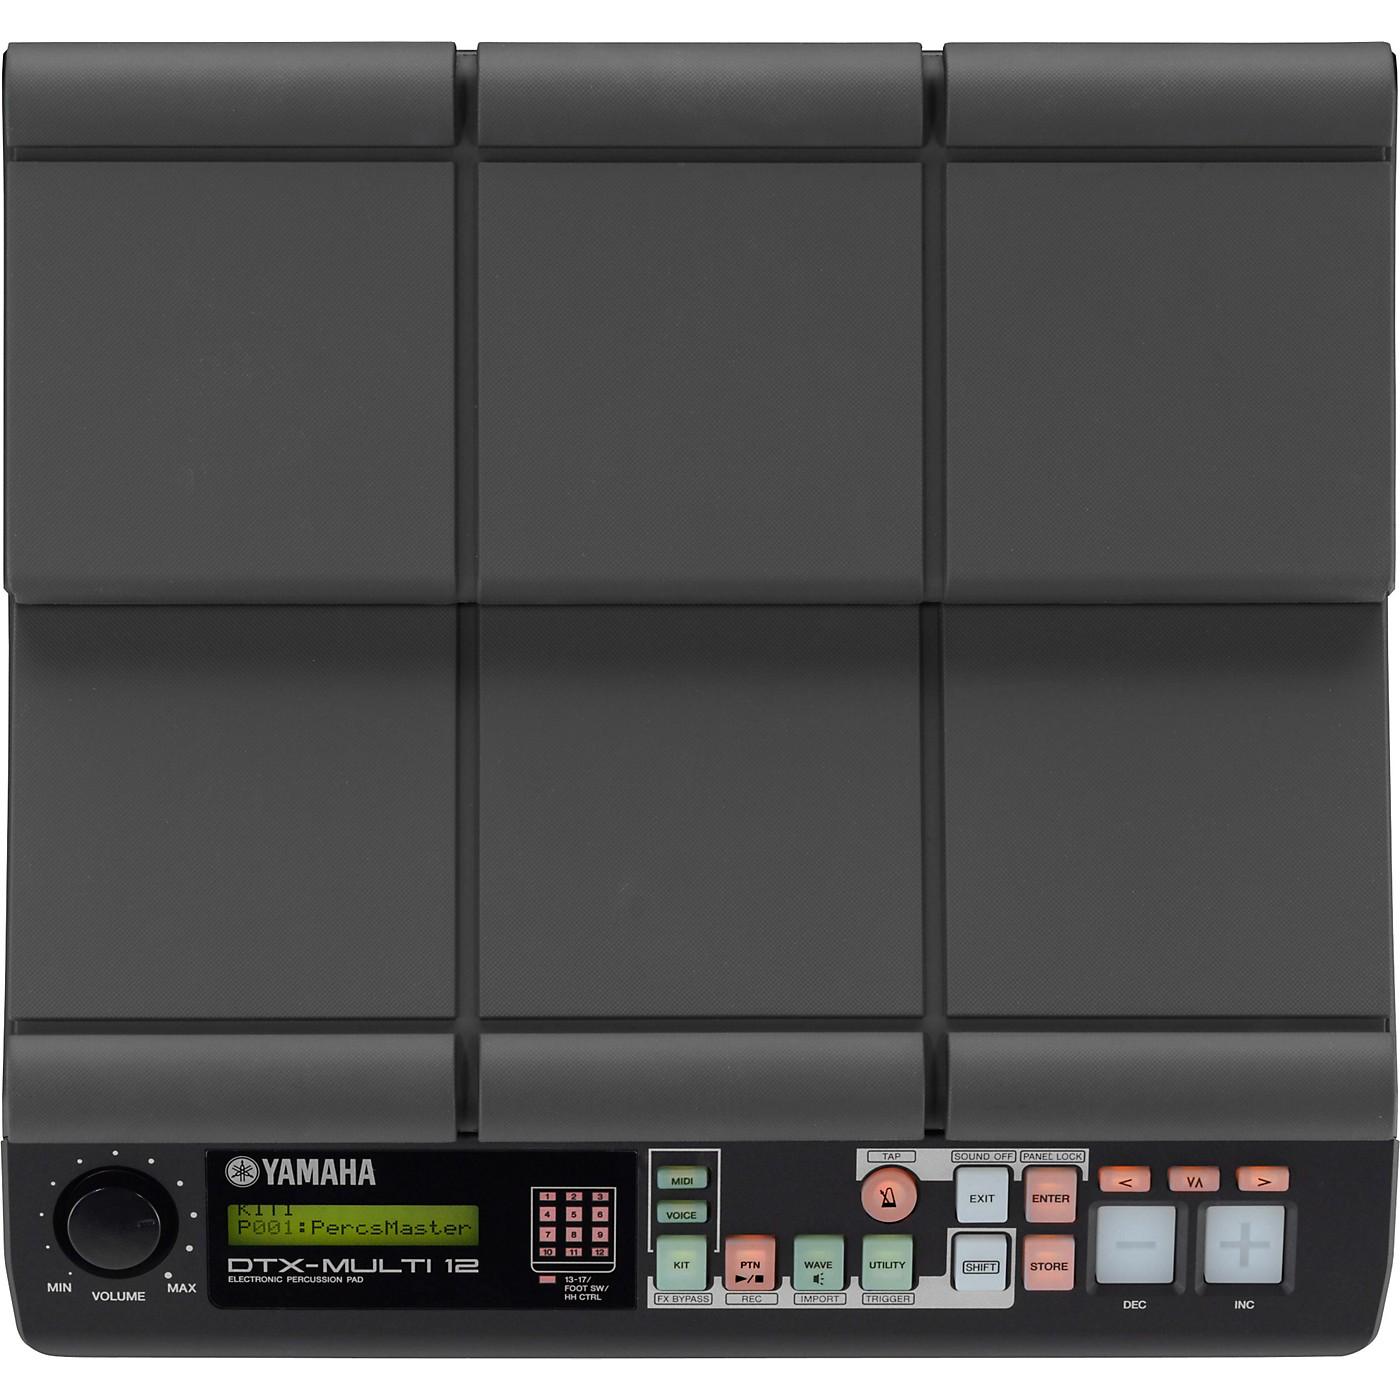 Yamaha DTX-MULTI 12 Digital Percussion Pad thumbnail